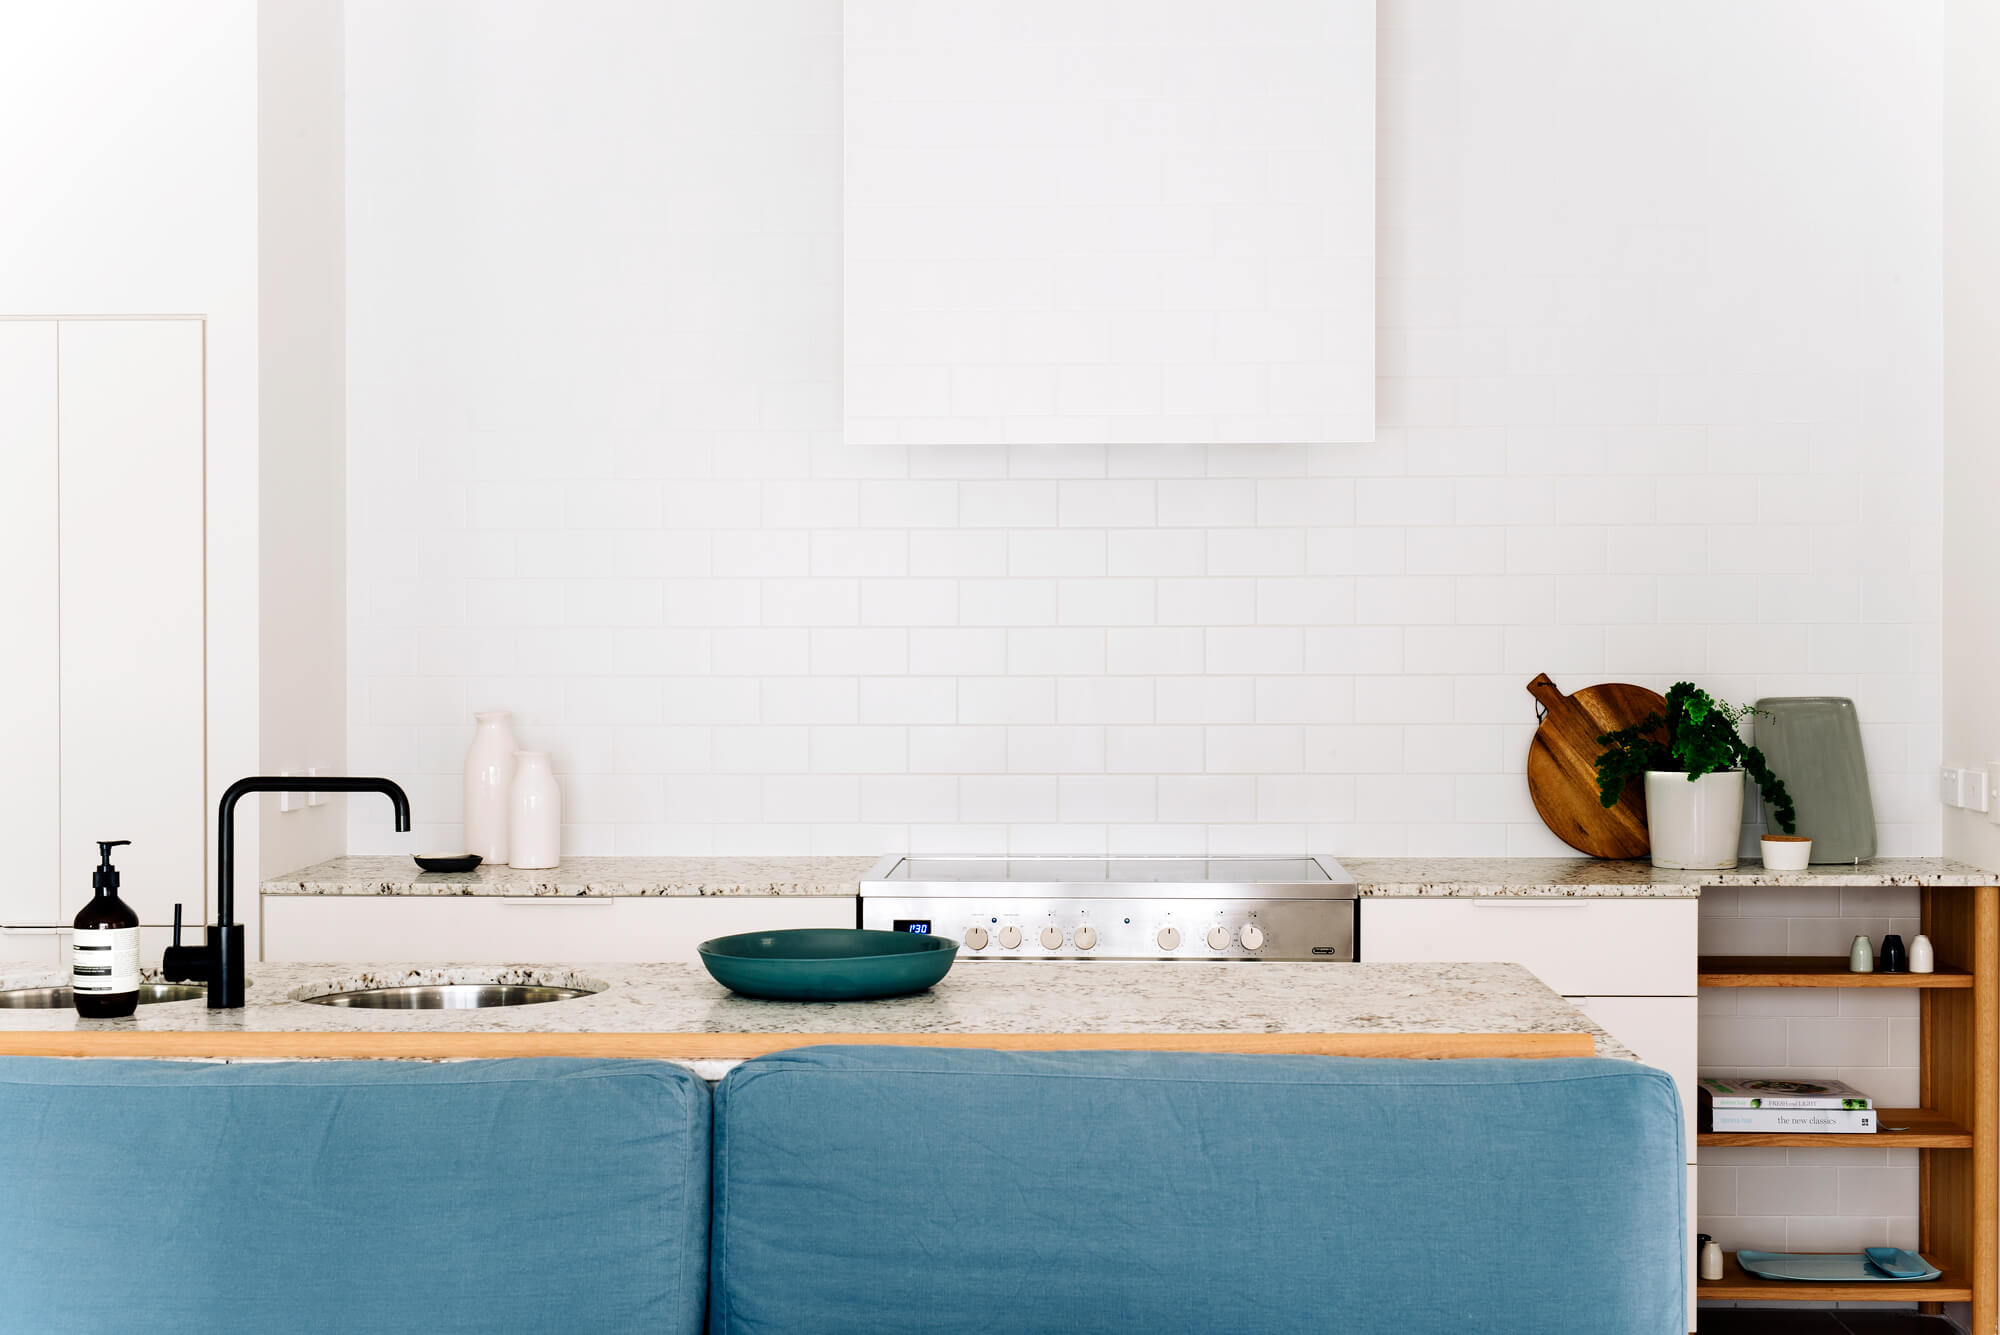 georgia-cannon-interior-designer-brisbane-project-r1-kitchen-6927.jpg